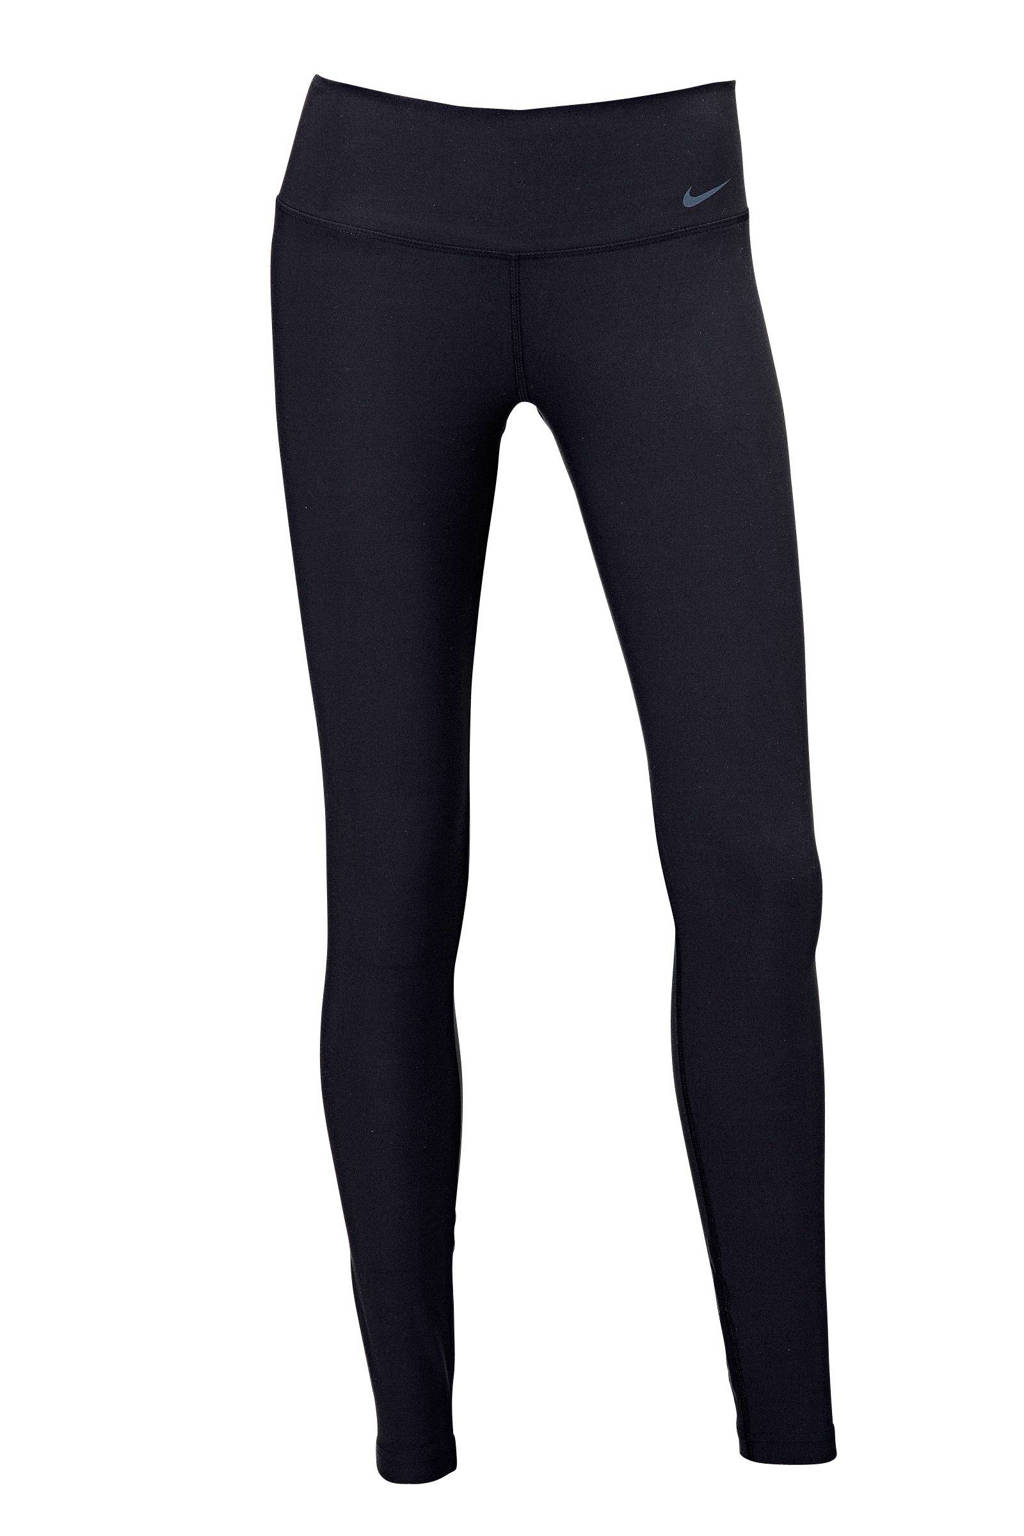 edcb967fcec Nike tight fit sportbroek | wehkamp